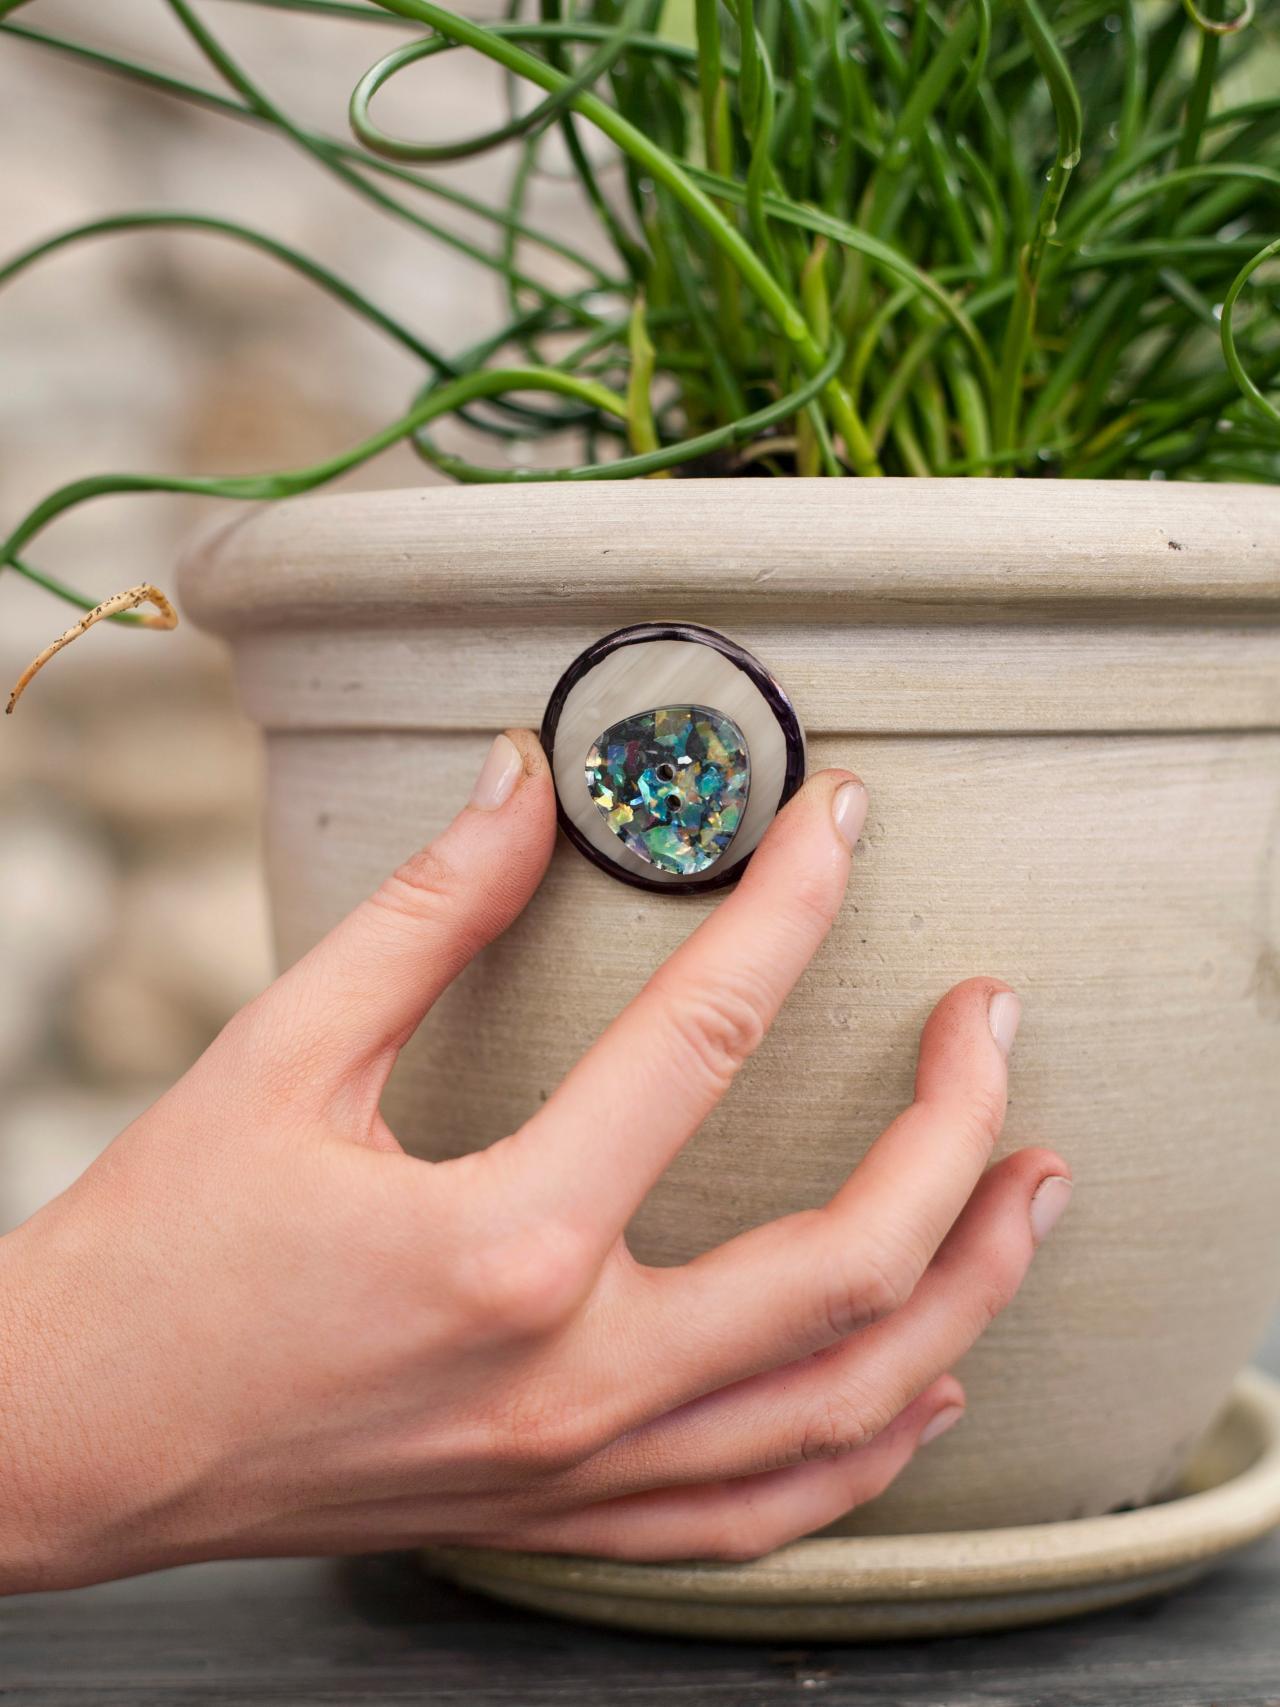 Garden Plant Pot Arrangement